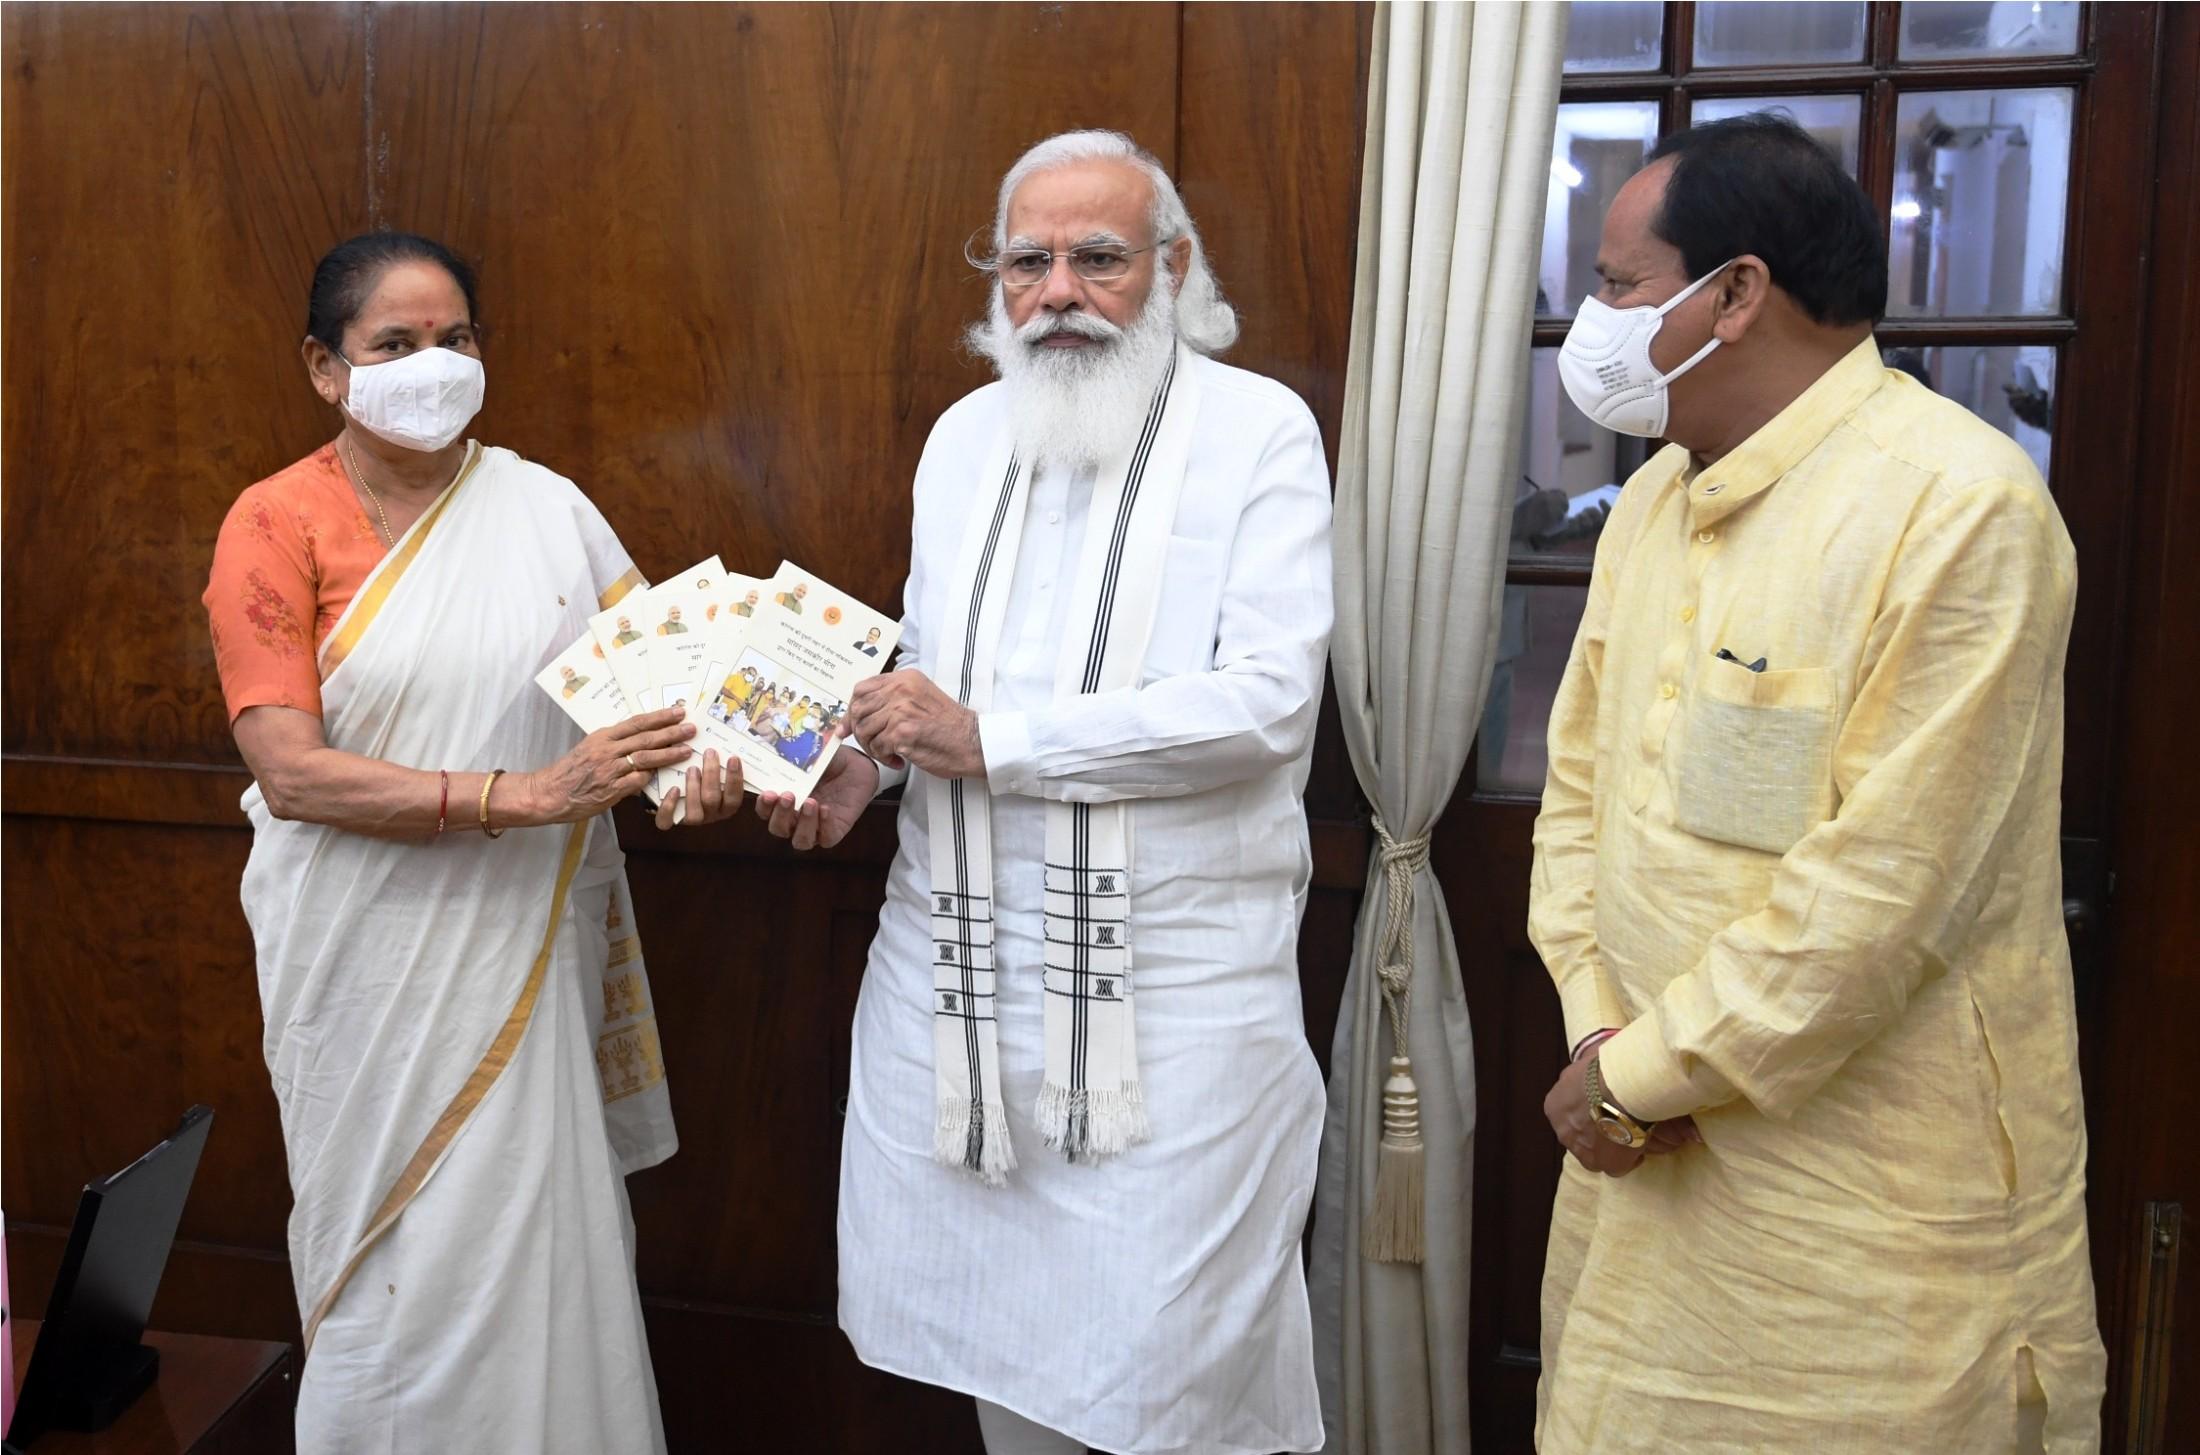 MP Meena met the Prime Minister